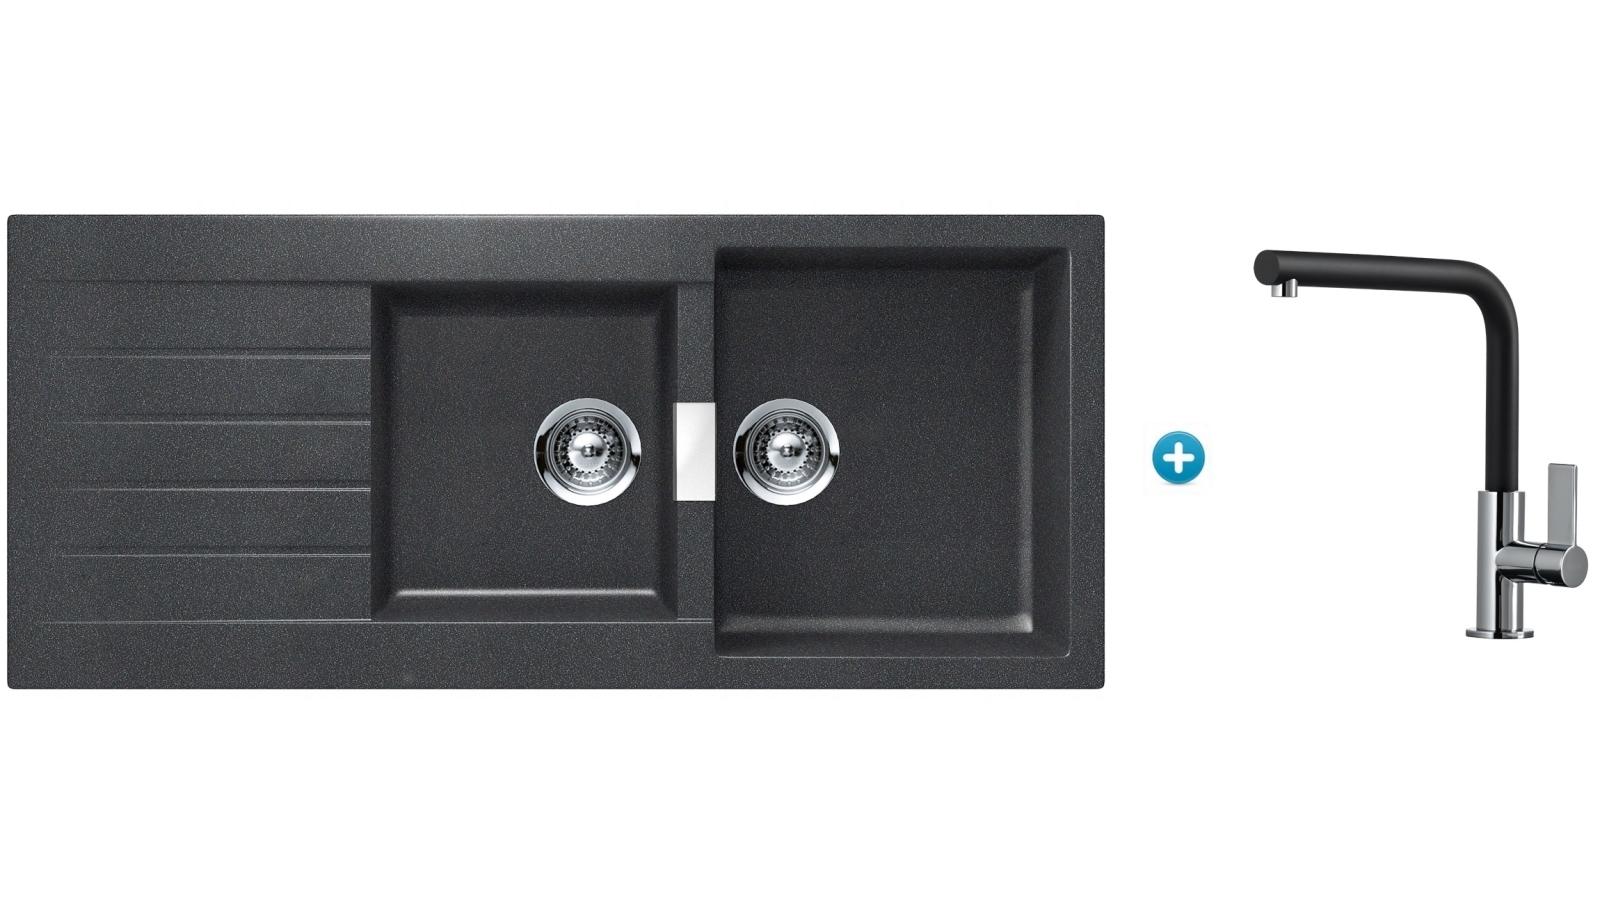 Buy abey schock signus kitchen sink and mixer package black harvey norman au